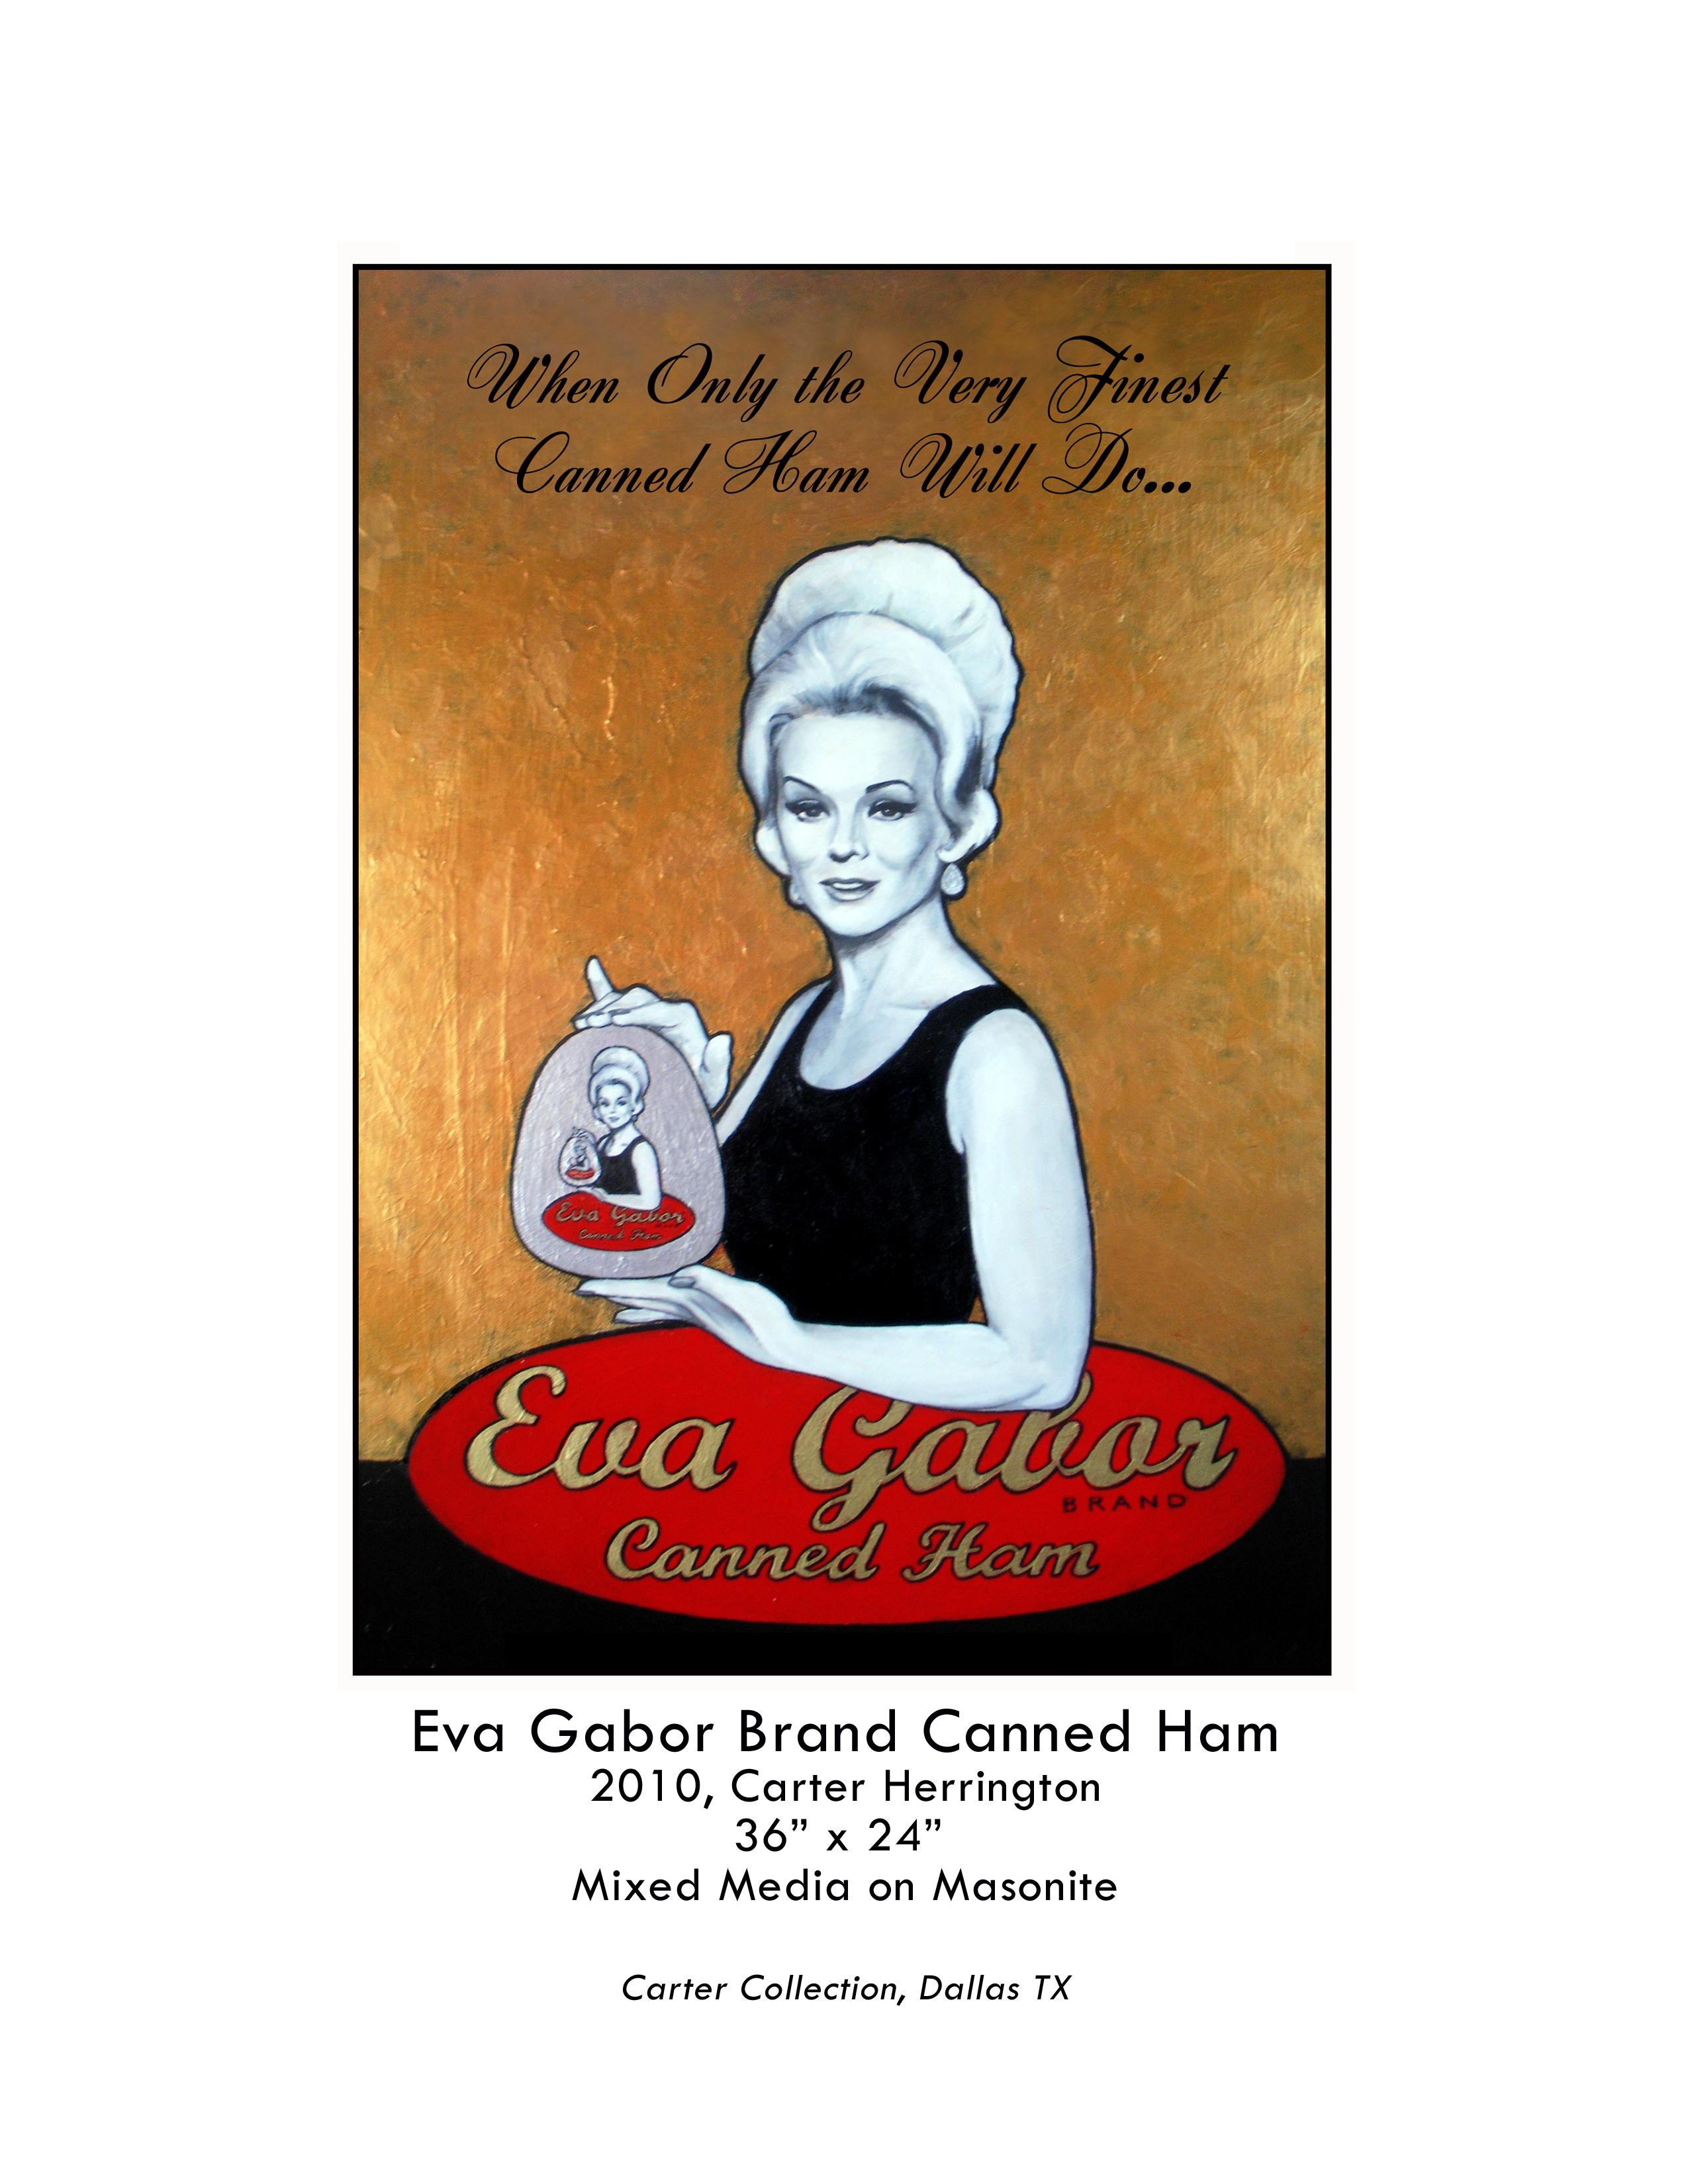 Eva Gabor Brand